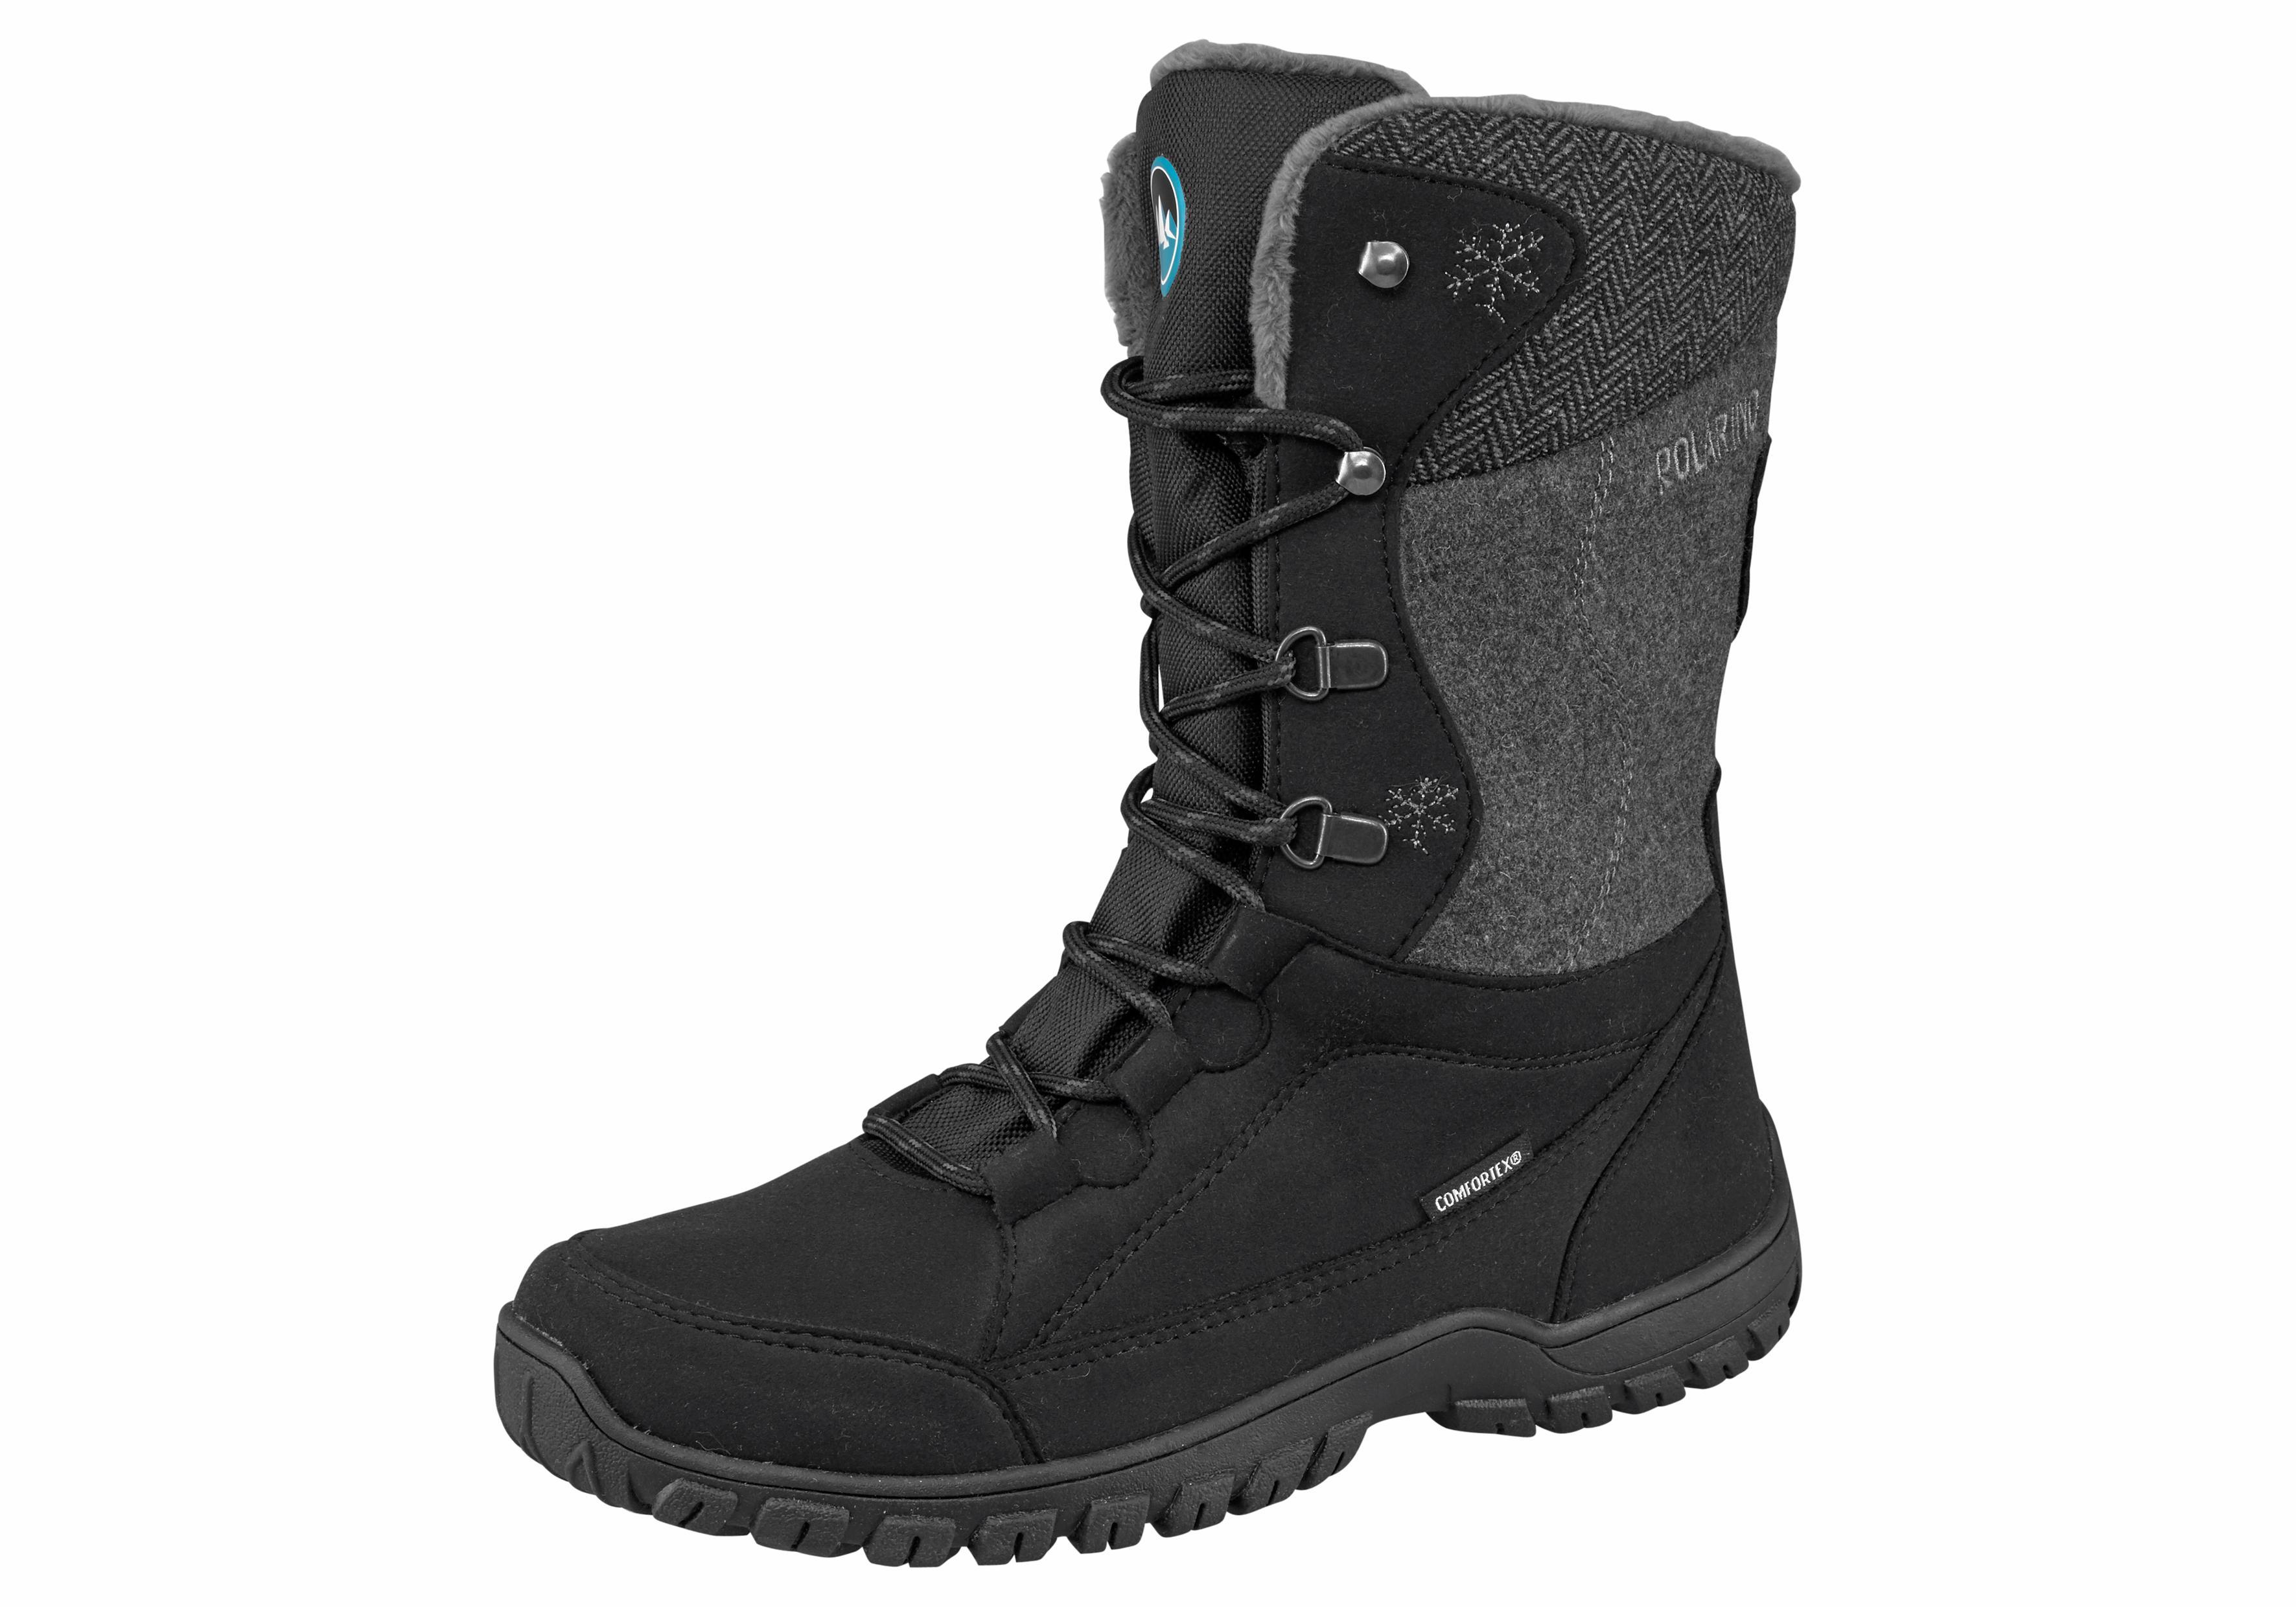 Polarino Outdoorwinterstiefel Boot Elin | Schuhe > Outdoorschuhe > Outdoorwinterstiefel | Polarino